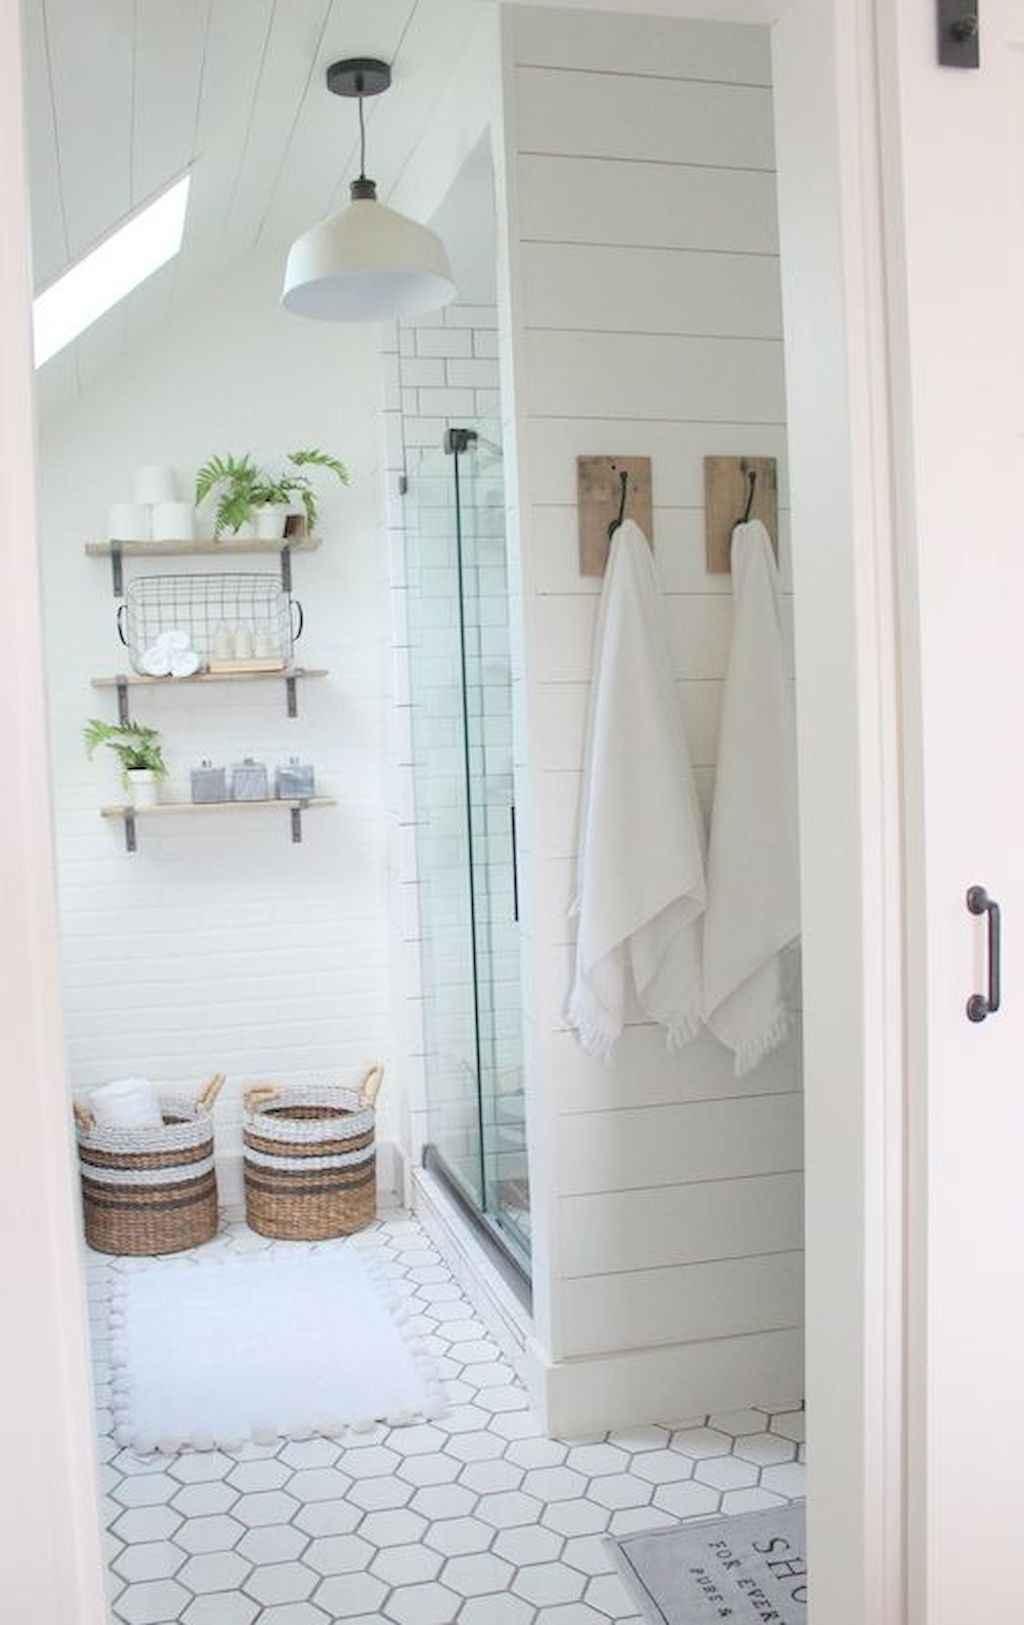 Rustic farmhouse master bathroom remodel ideas 27 for Rustic farmhouse bathroom ideas